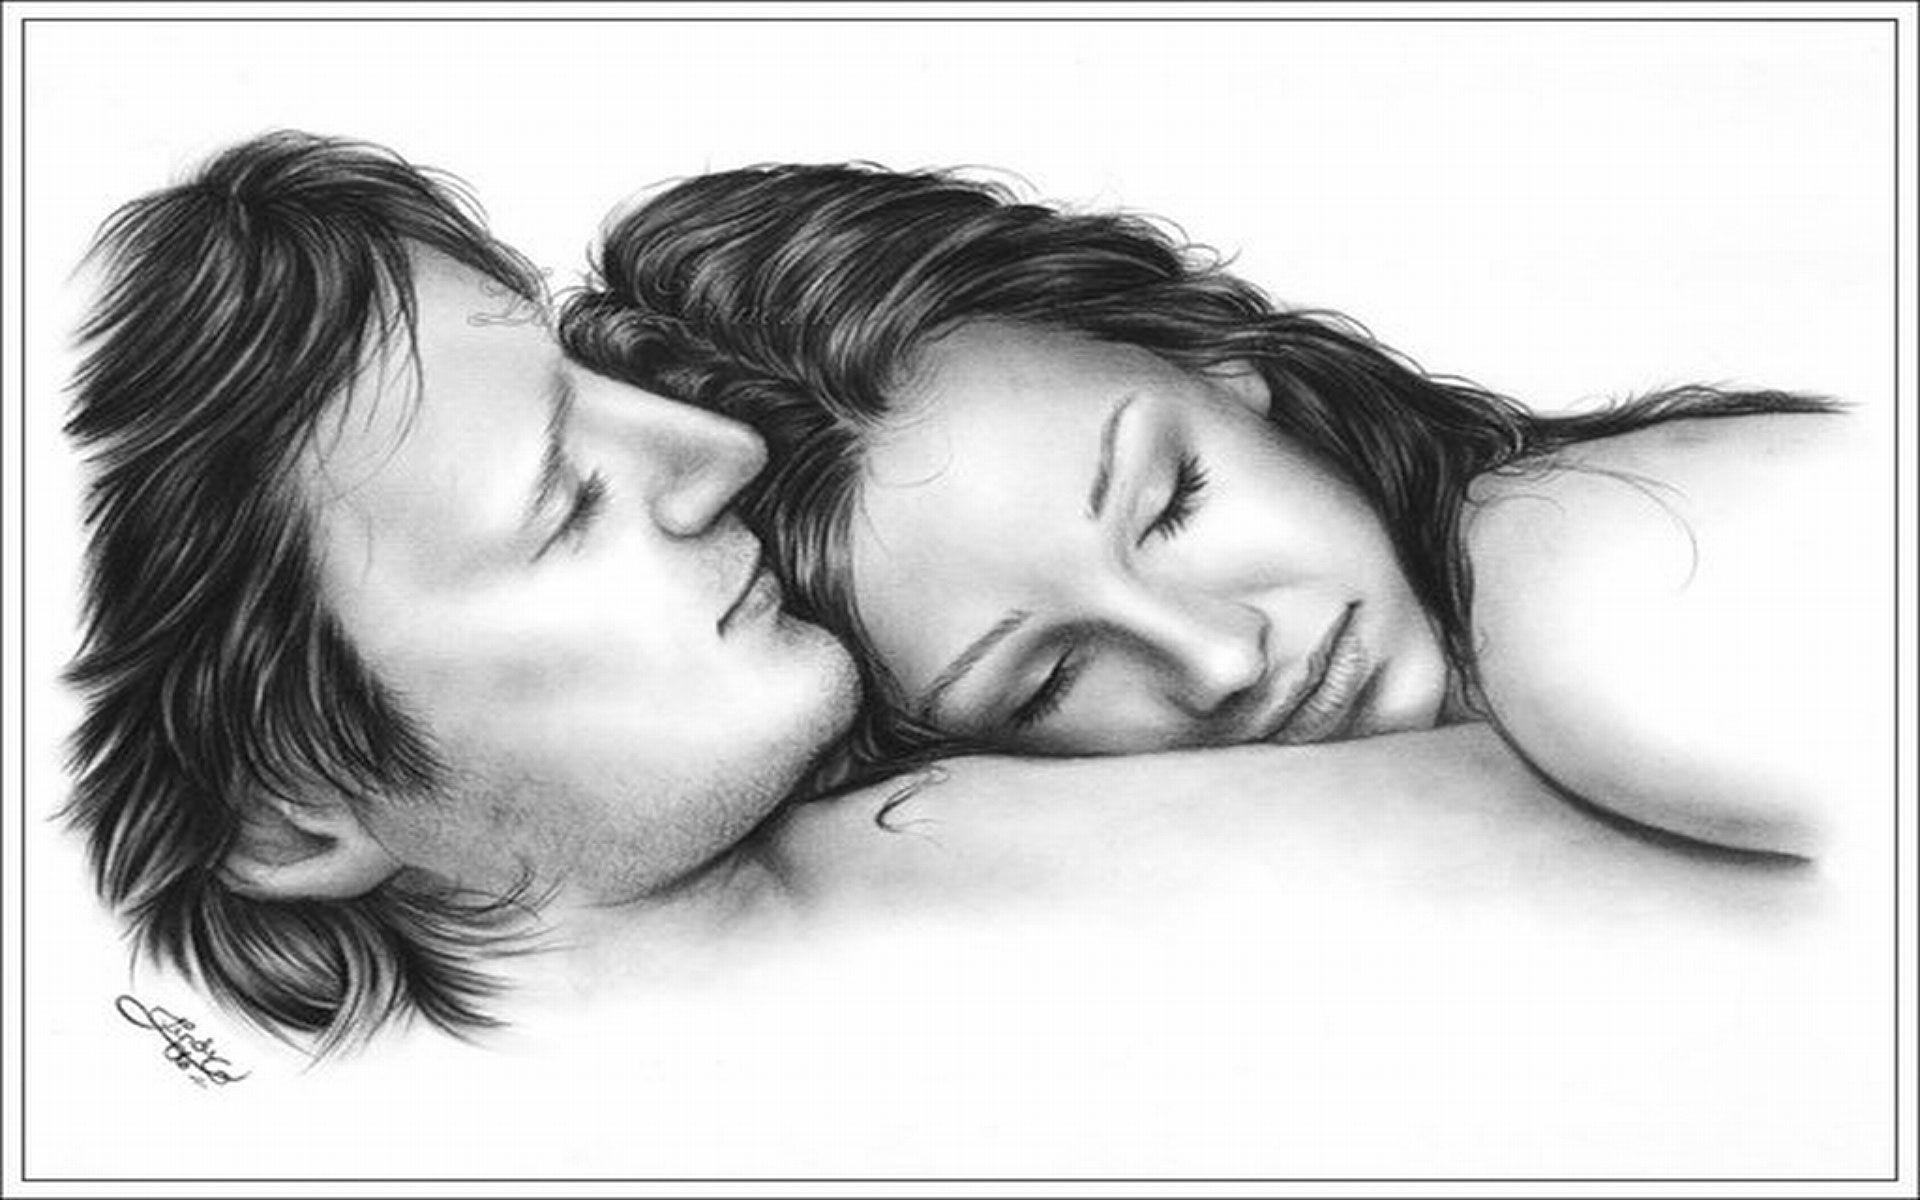 Romantic Sketch Wallpaper Romantic Sad Couple Wallpapers